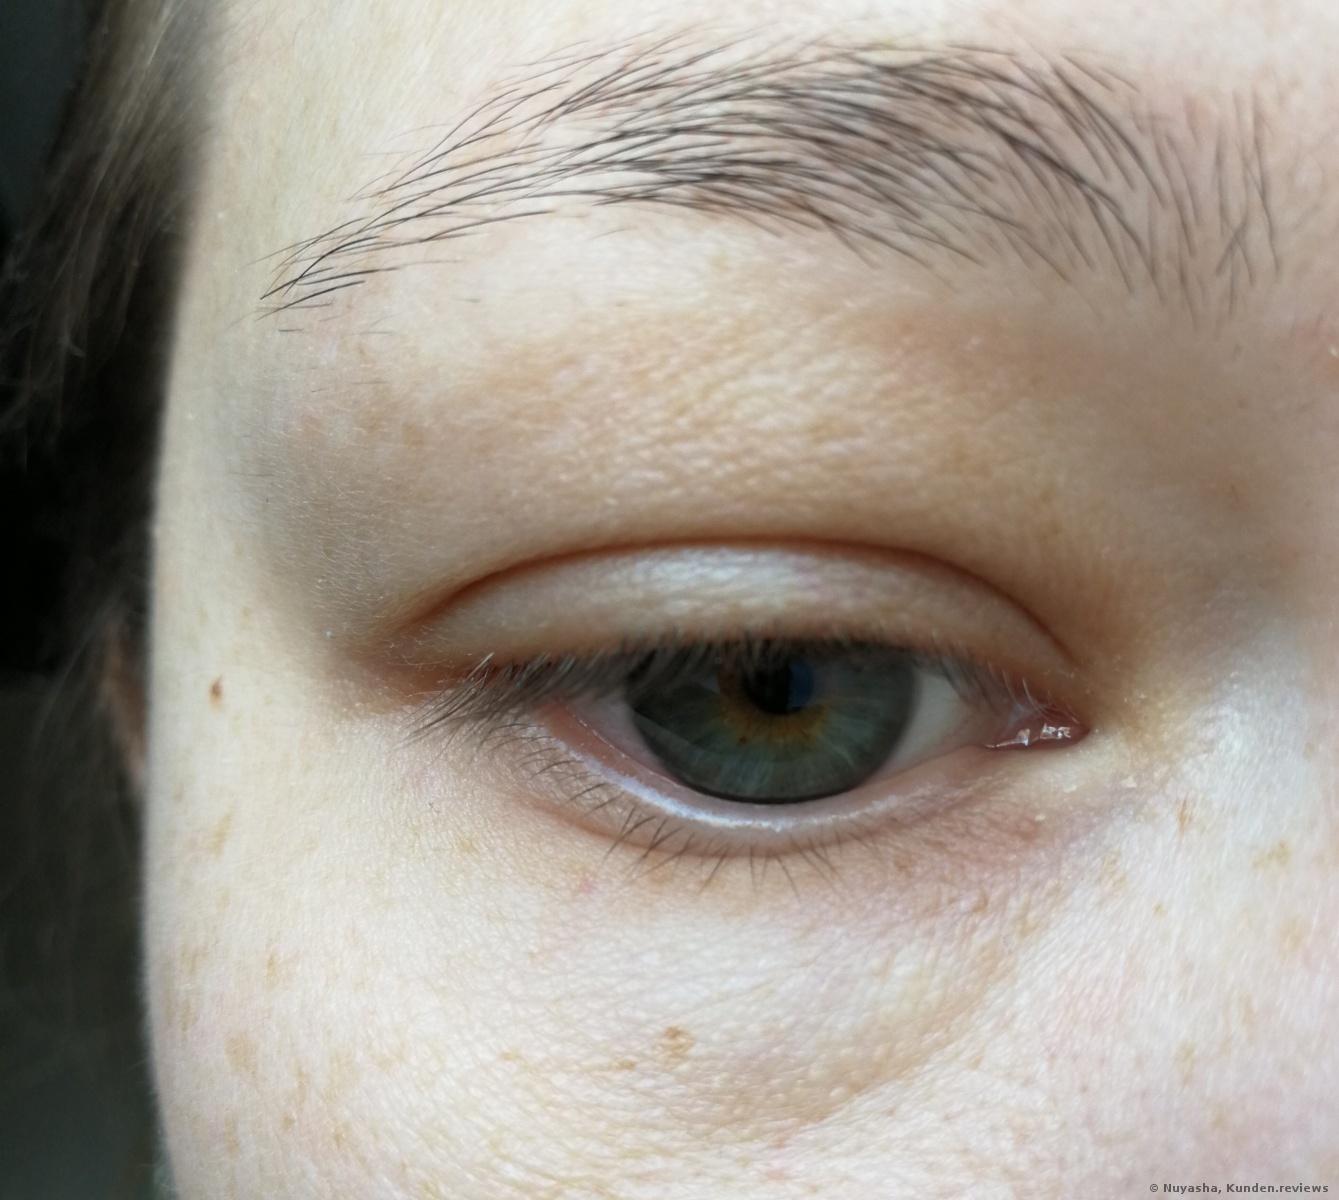 Kiehl's Creamy Eye Treatment with Avocado Augencreme Foto